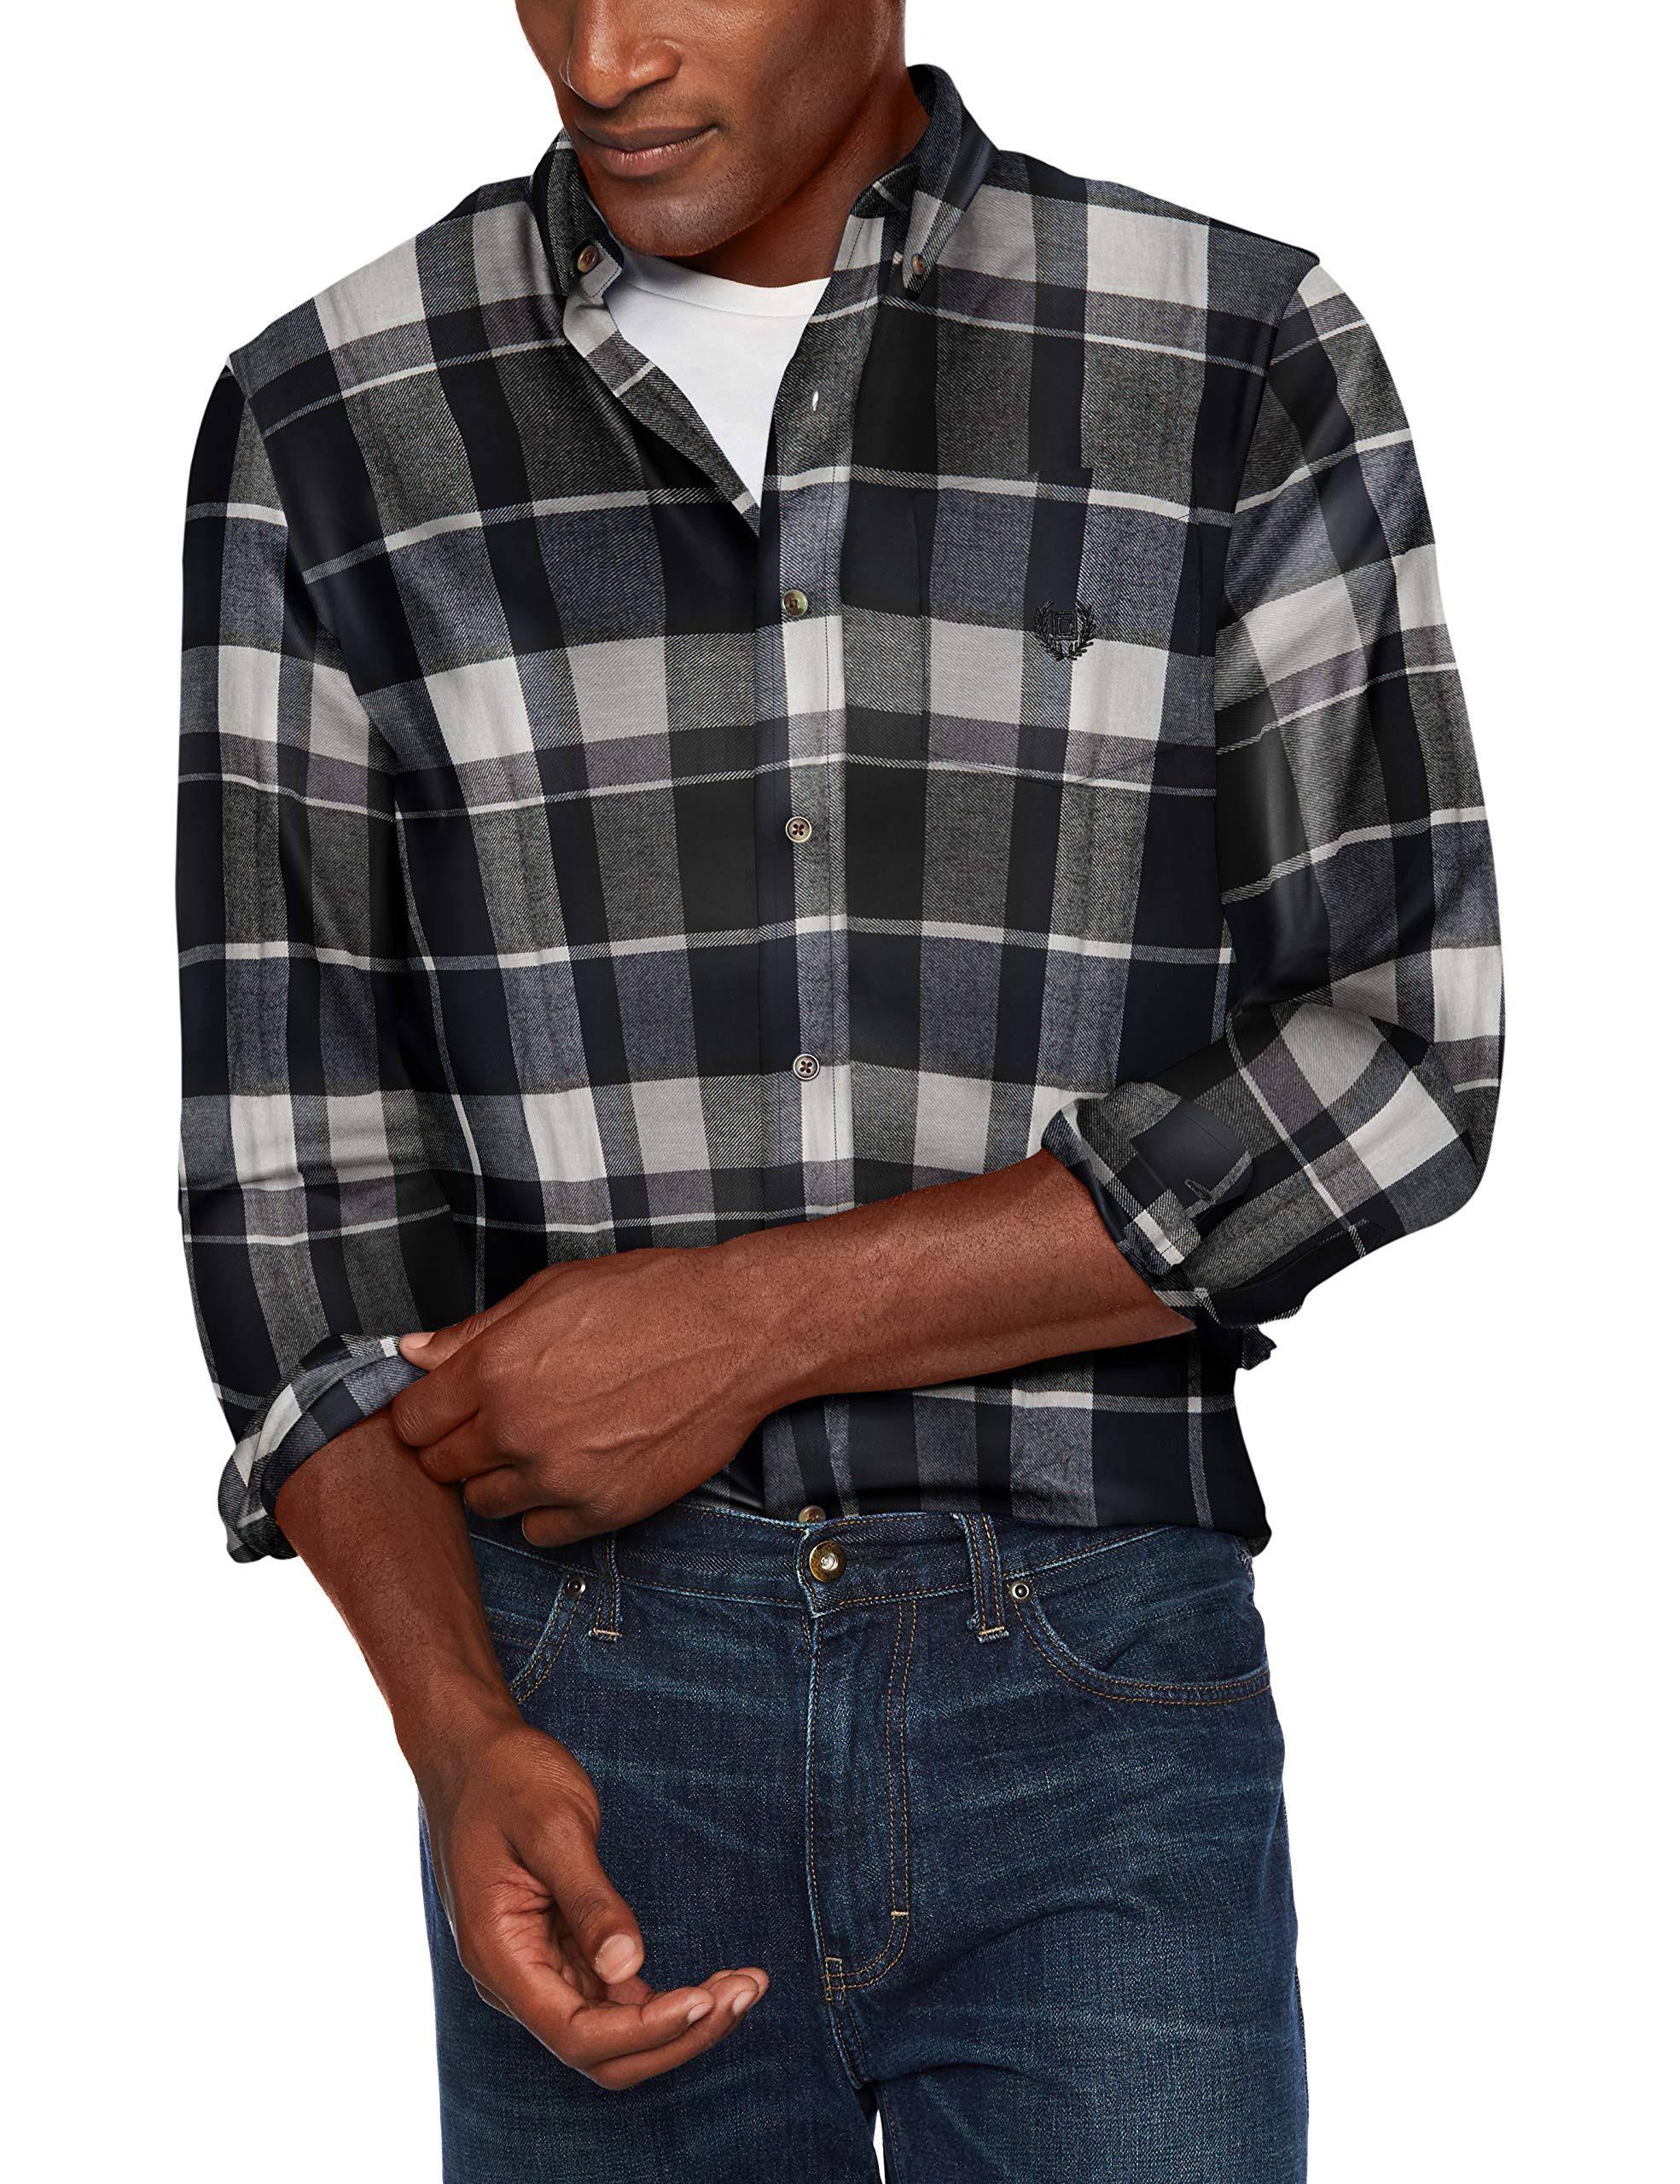 Larga Fit Chaps Manga De Azul Marino Classic Hombre Franela Para Negro Camiseta 6wZ1USwnB